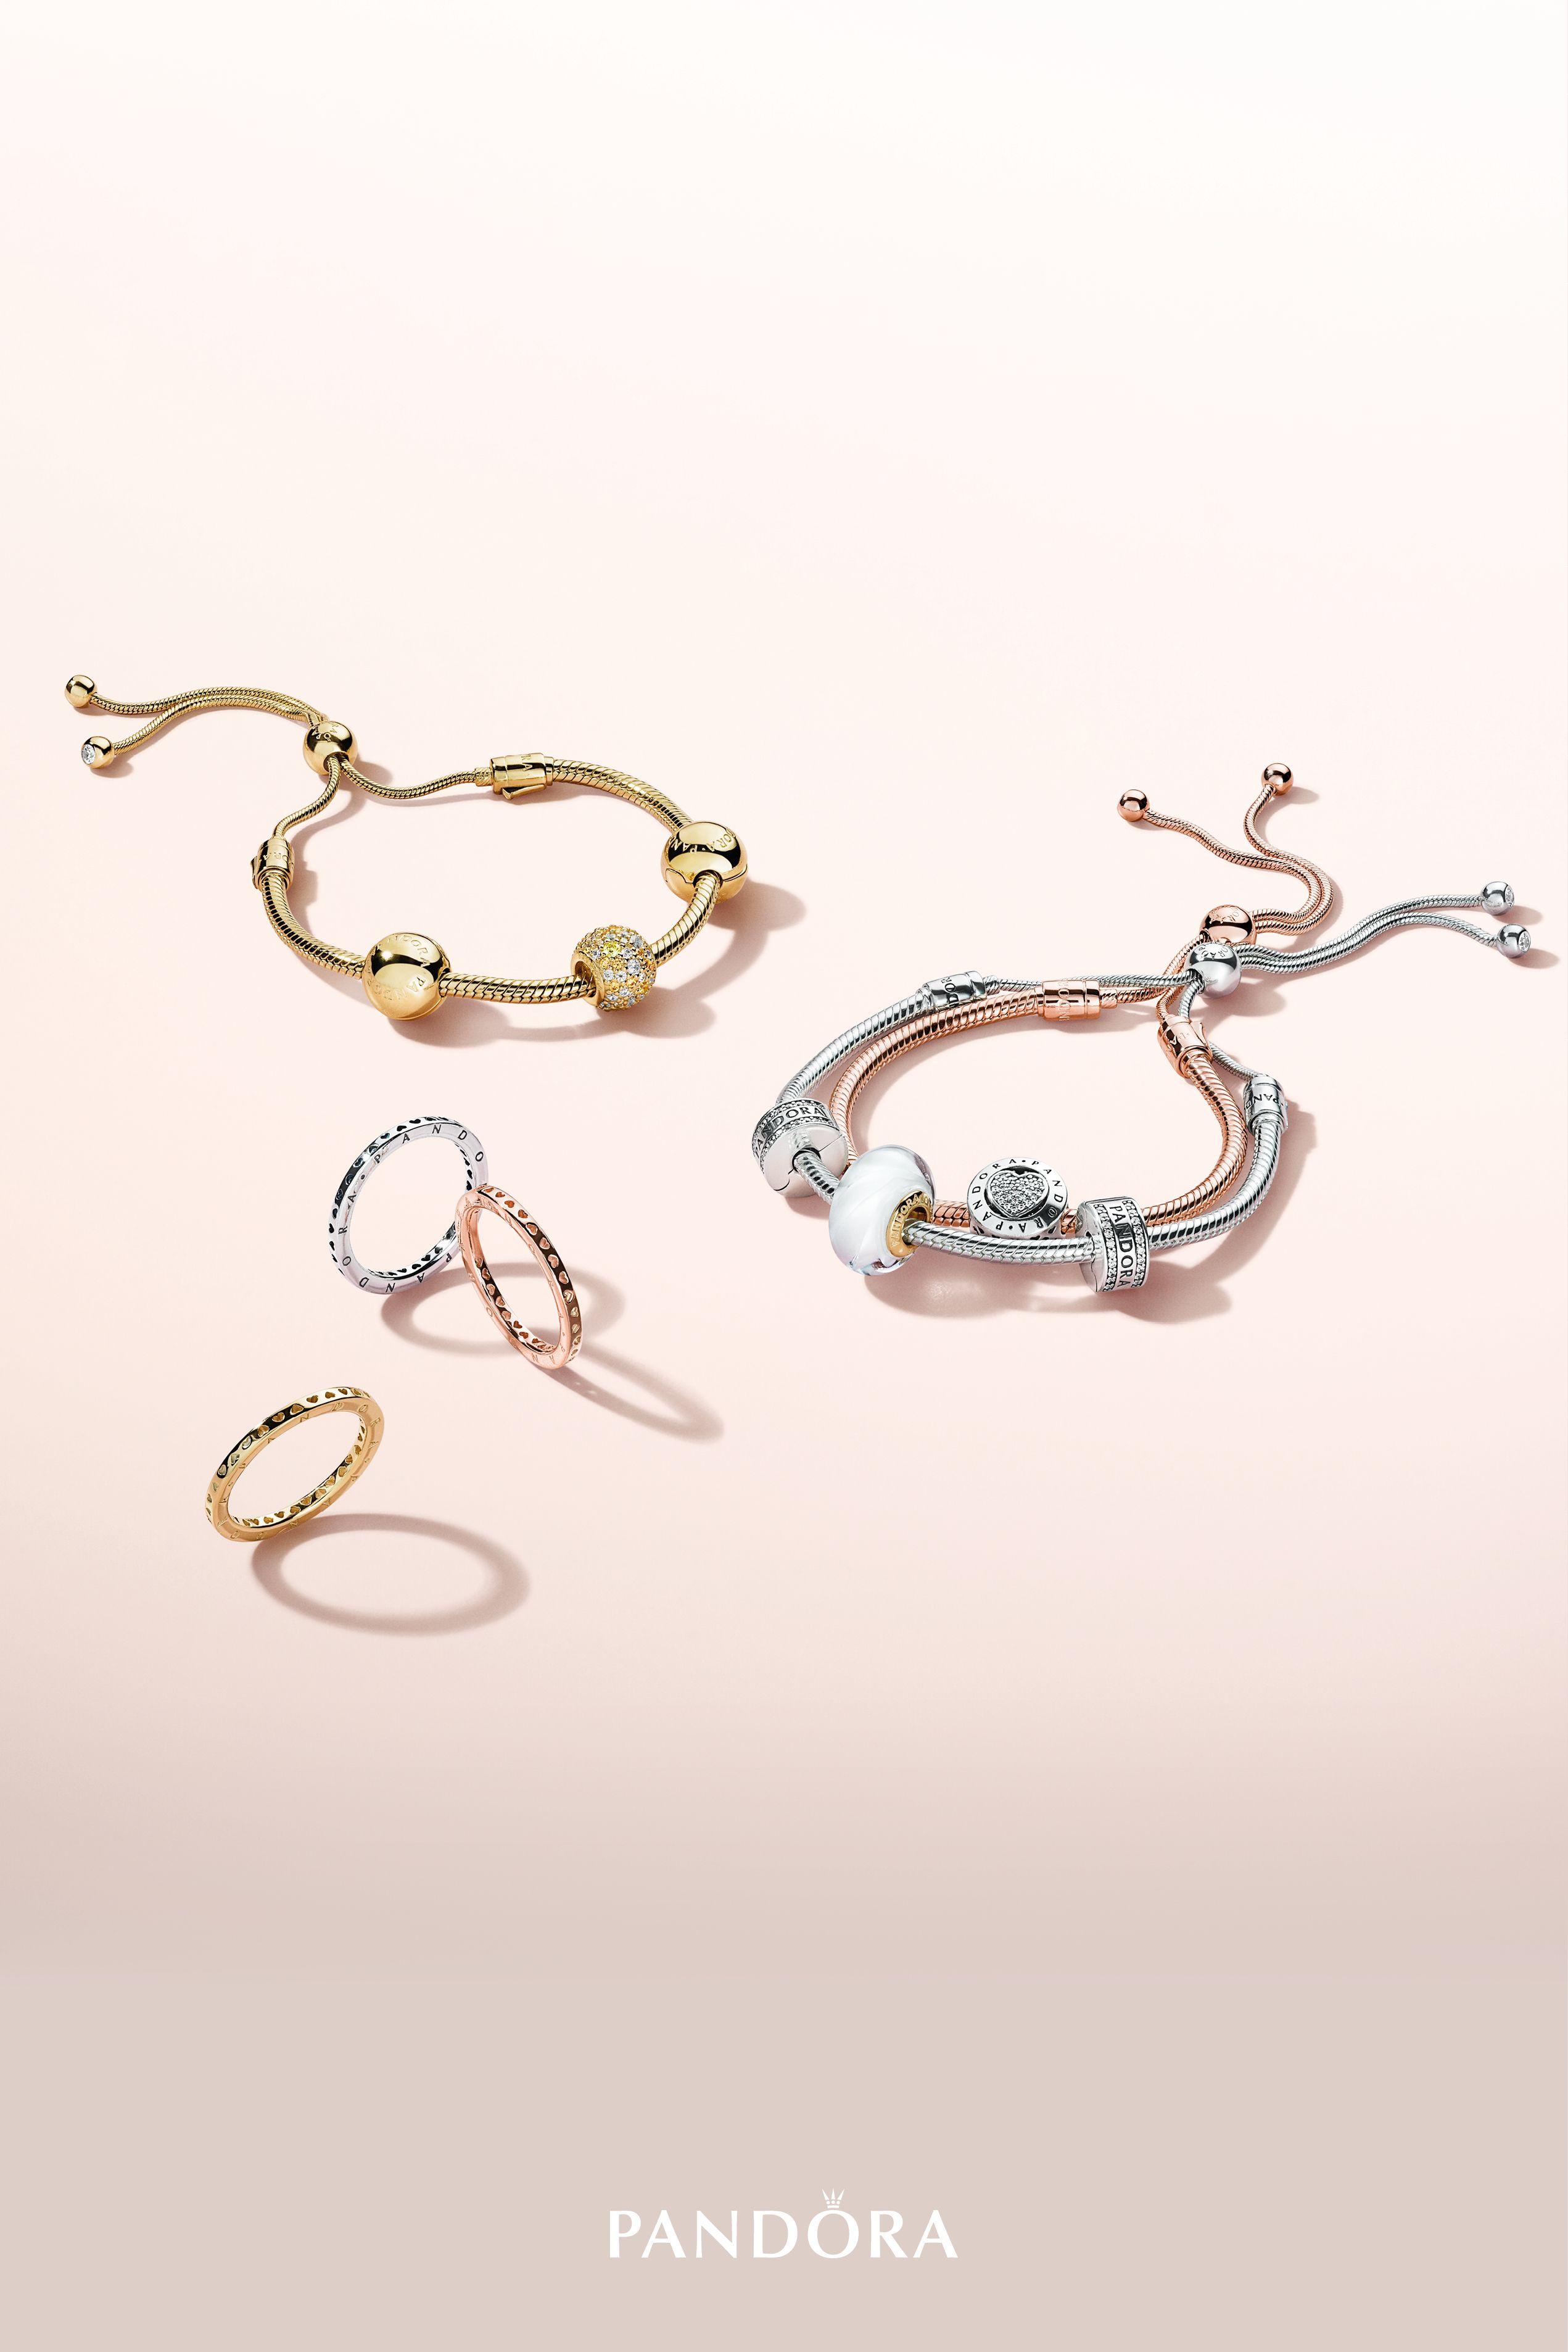 422d2052a0b6 Create one-of-a-kind looks with the new PANDORA Sliding Bracelets ...